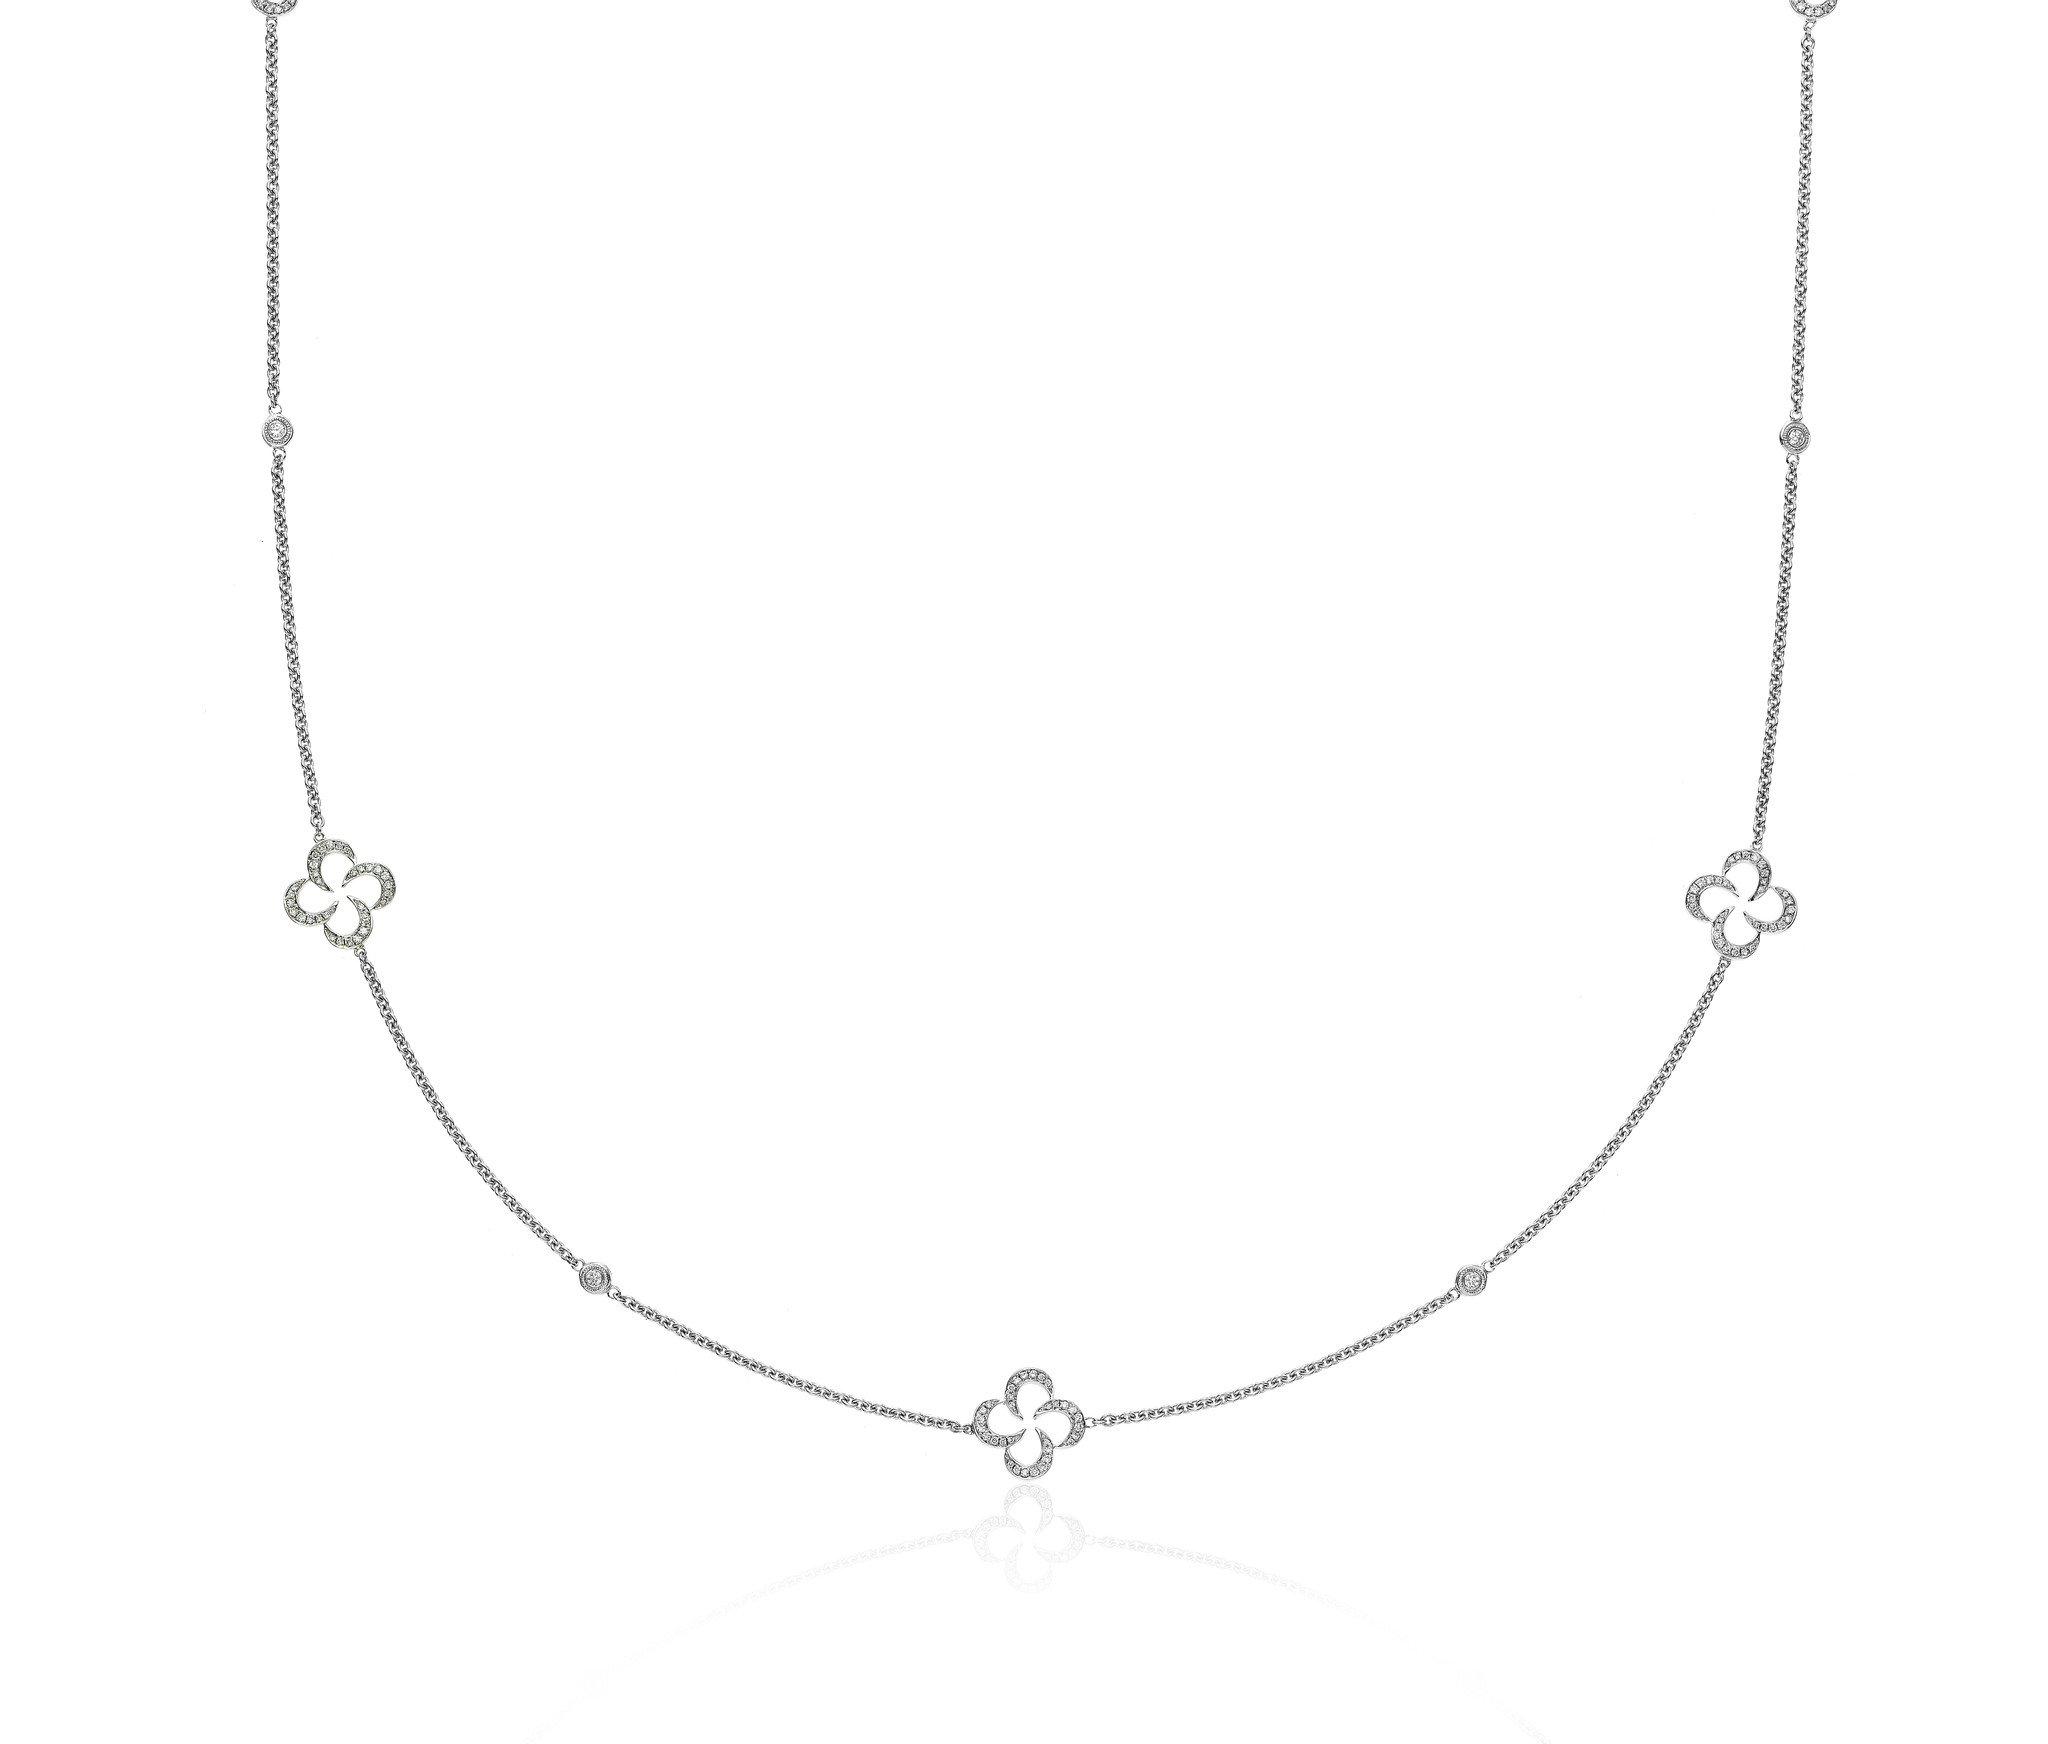 Swirly Clover Diamond Necklace